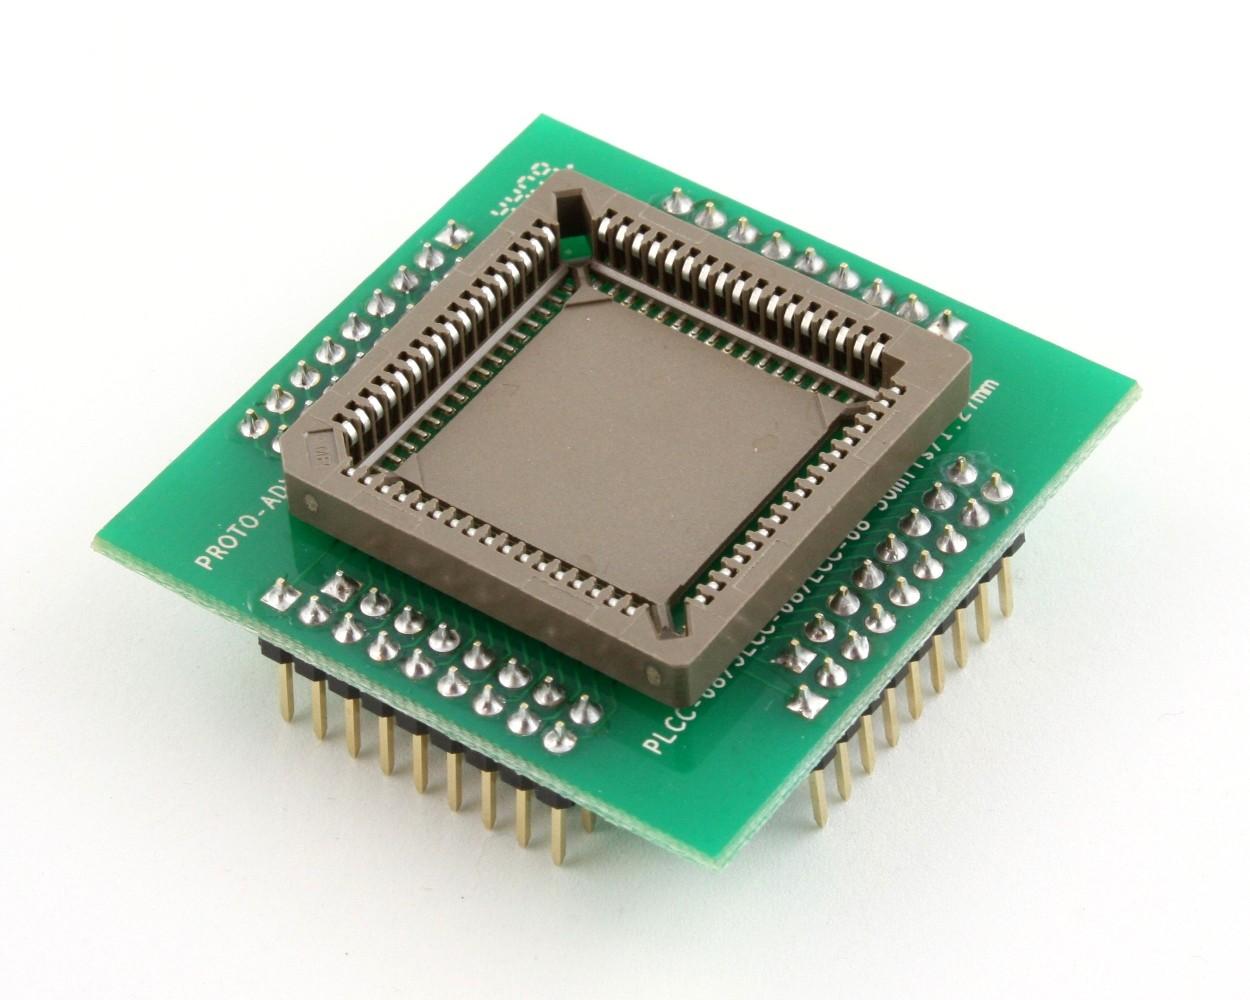 PLCC-68 Socket to PGA-68 Adapter (1.27 mm pitch, 25 x 25 mm body 0